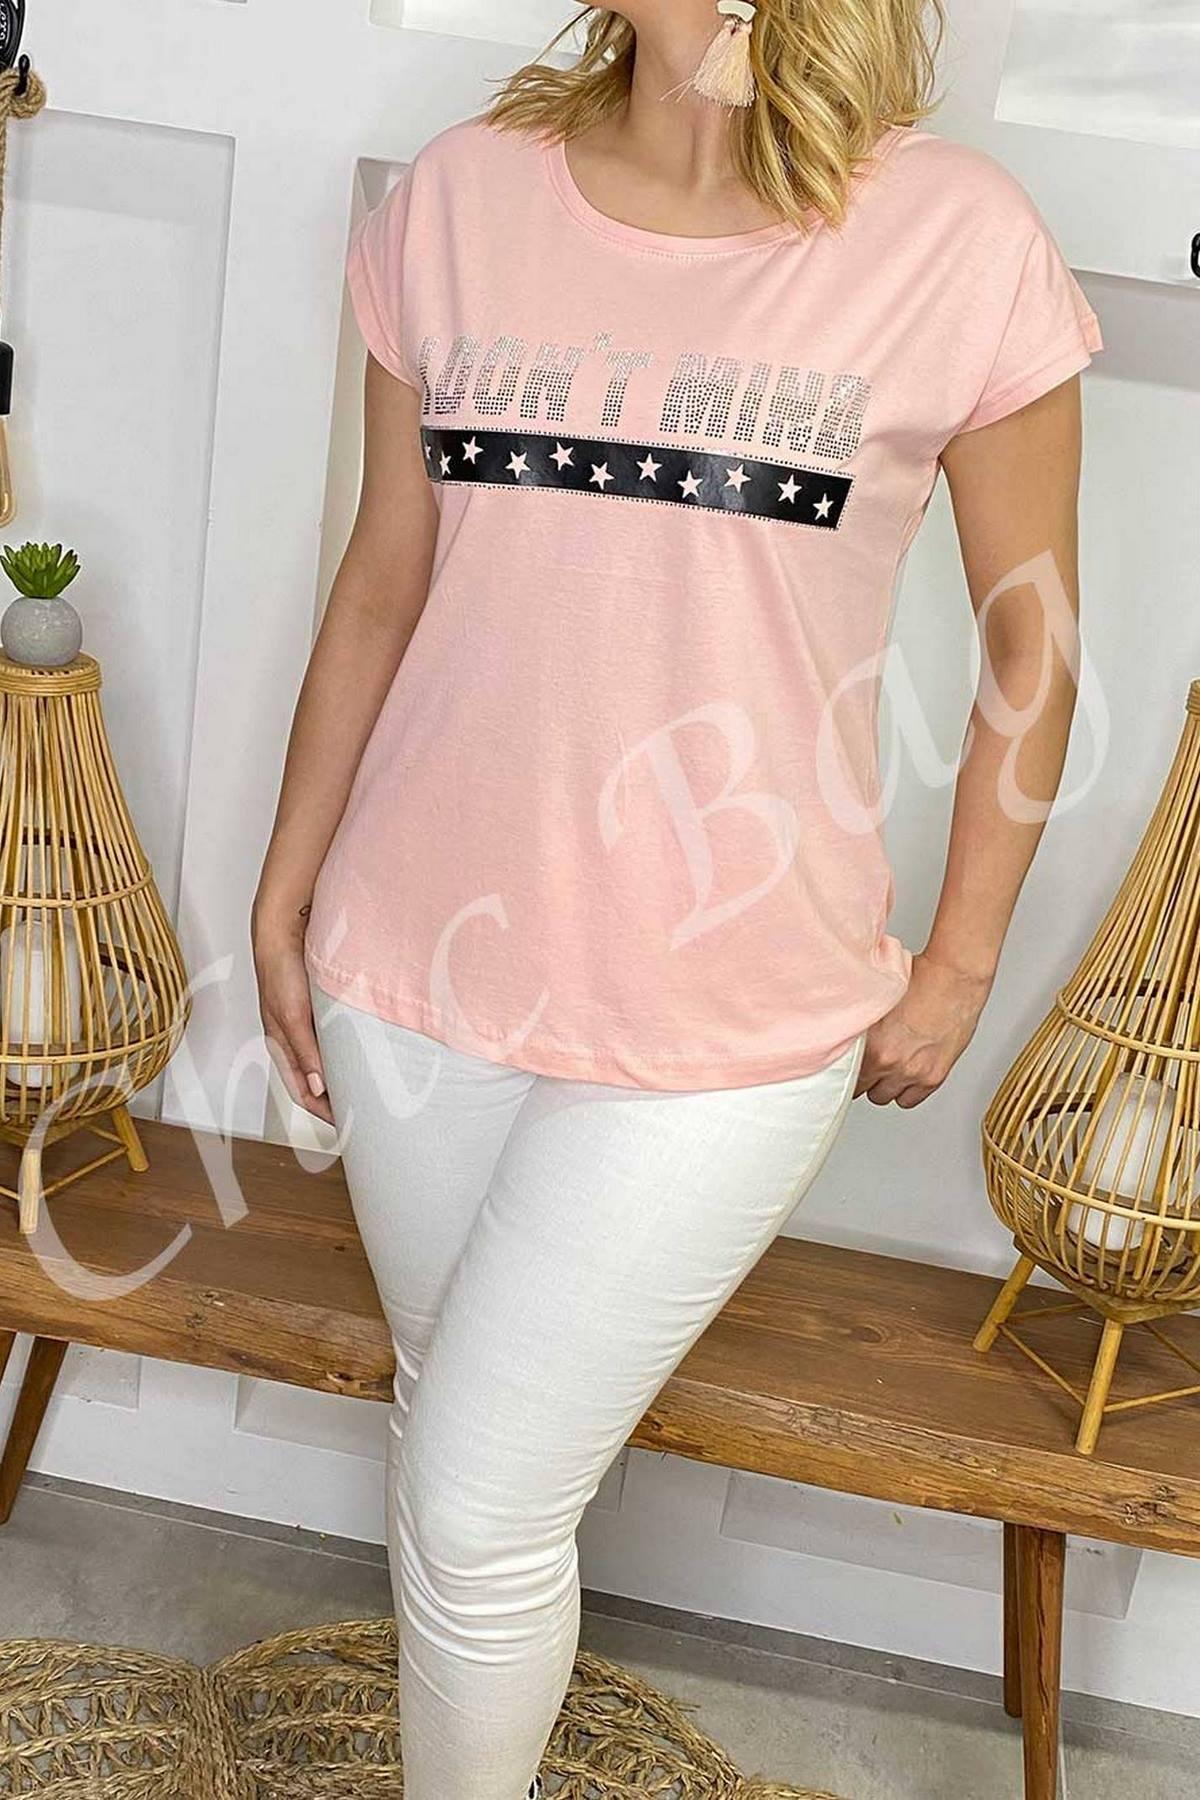 https://resim.chicbag.com.tr/p000955/ppb/i-dont-mind-baski-t-shirt-swns-01df4f8b51aa.